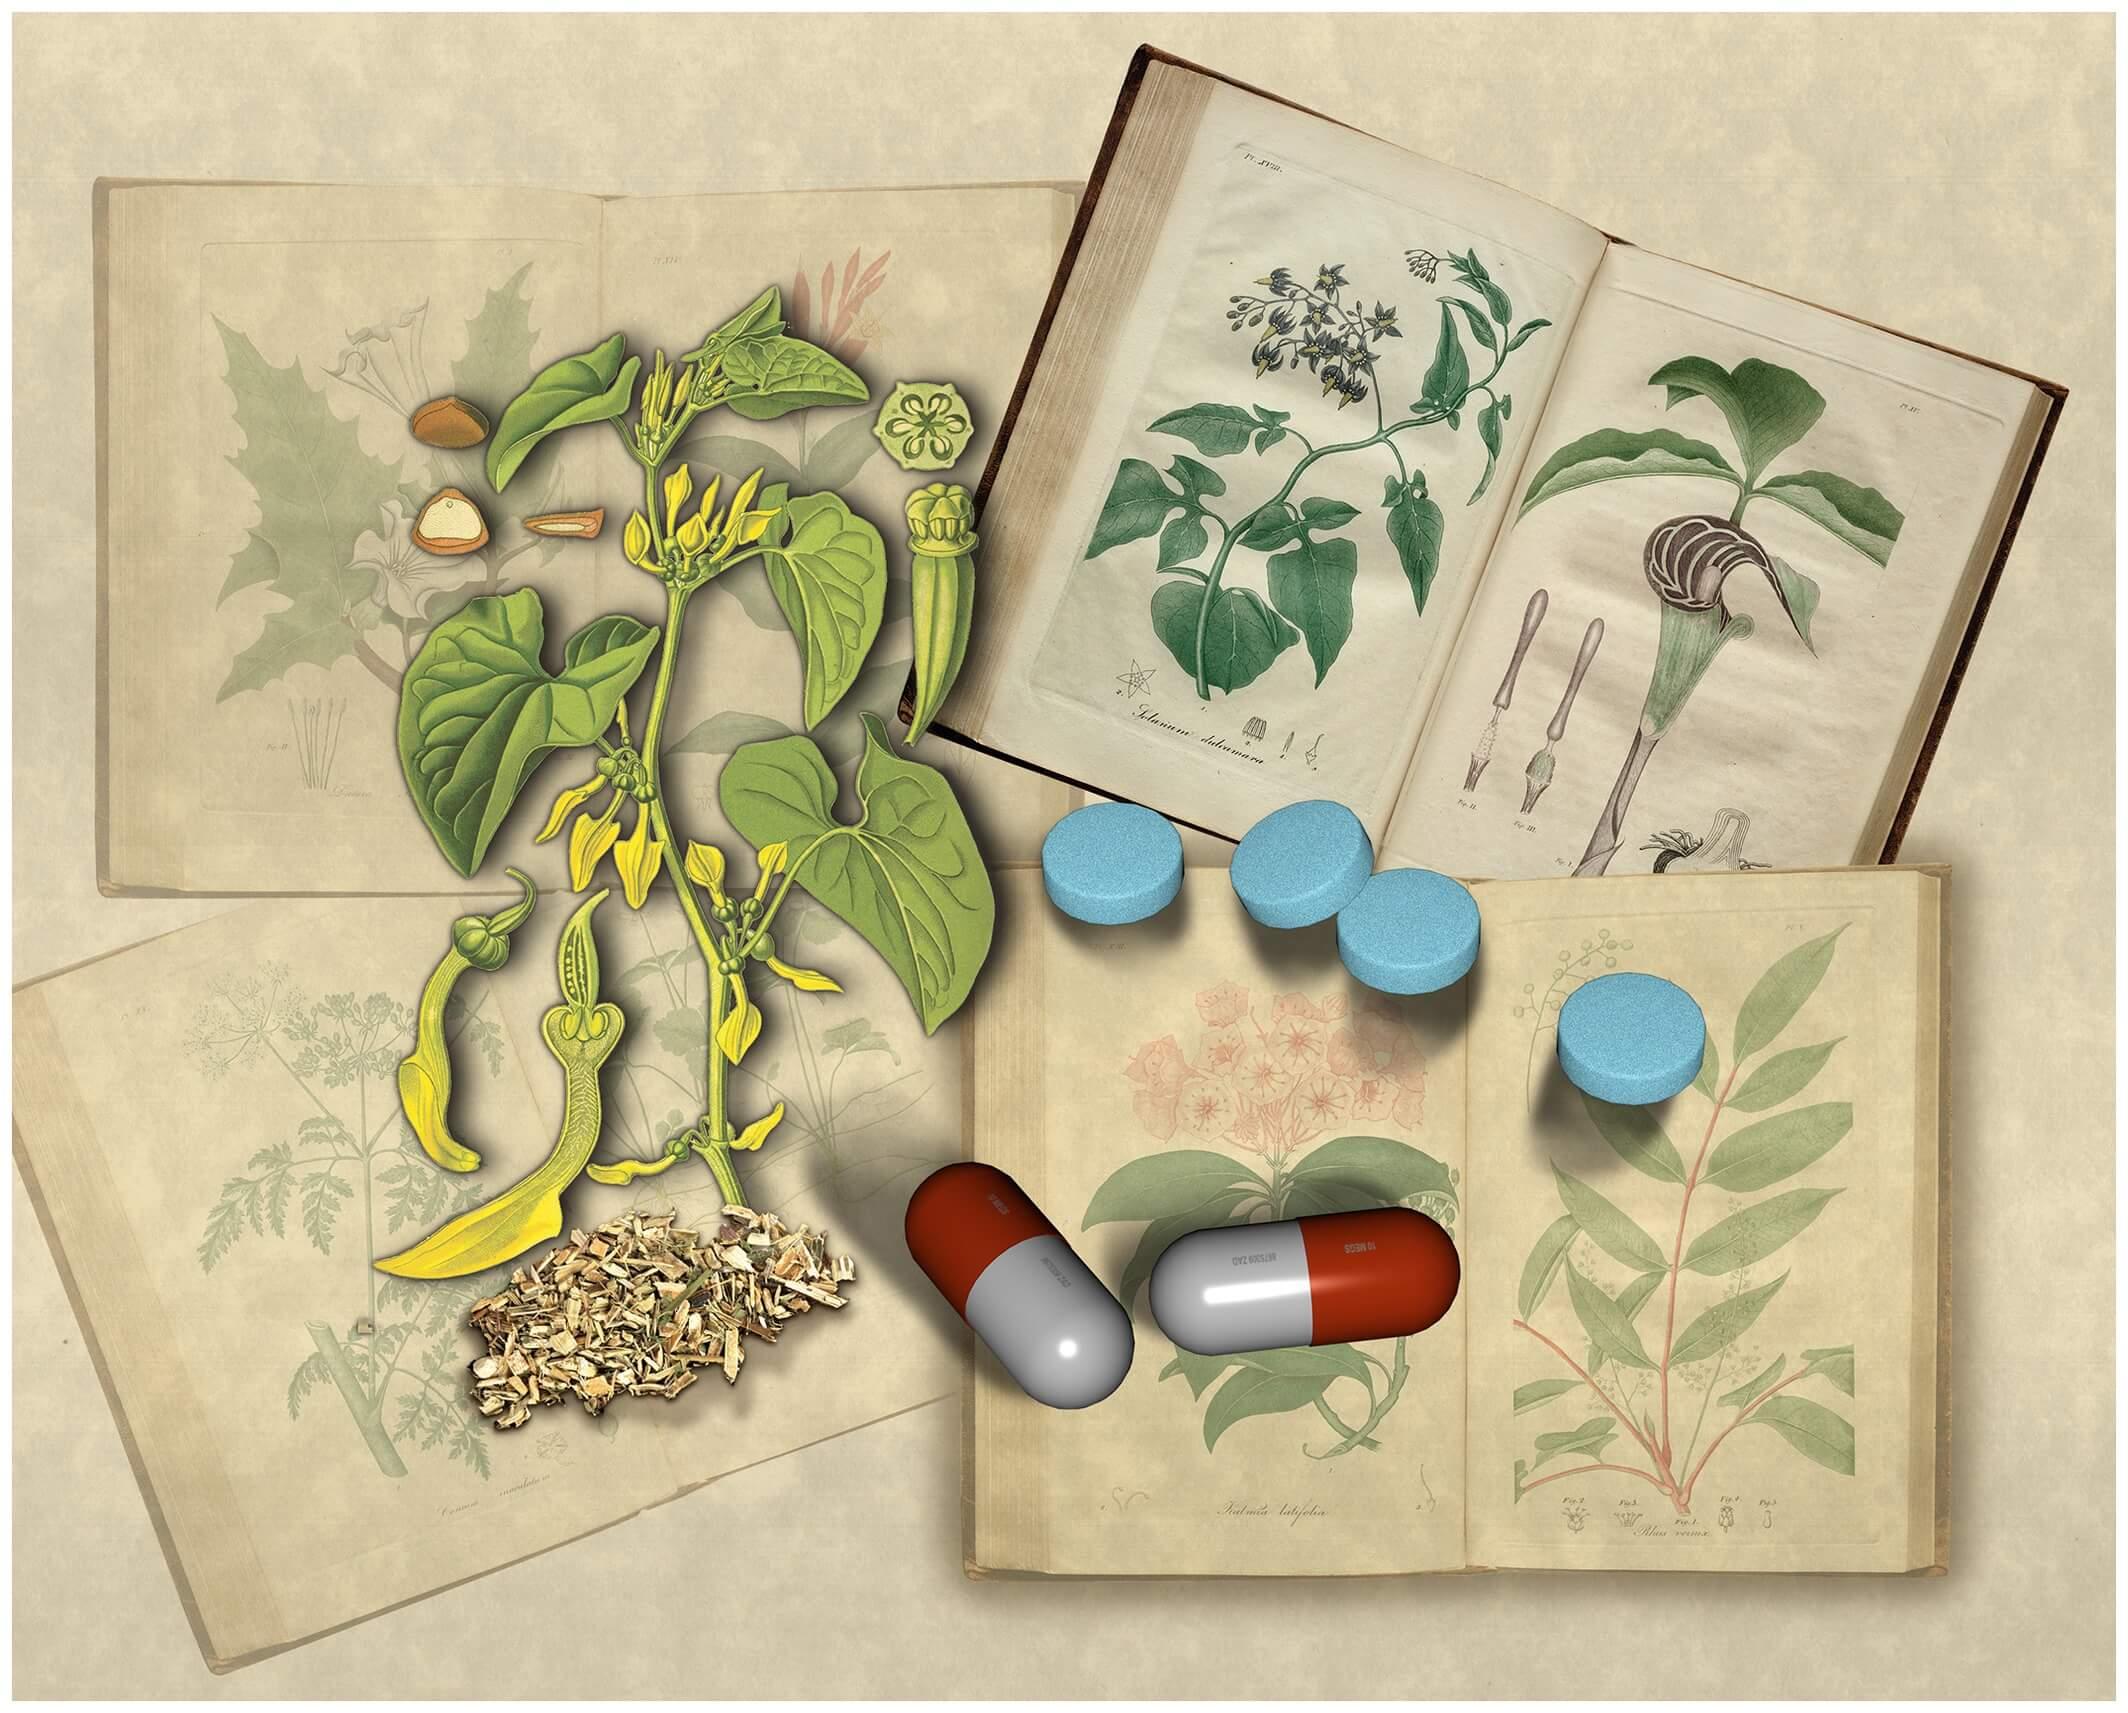 Gardeners Beware! European Plant Could Poison Your Kidneys